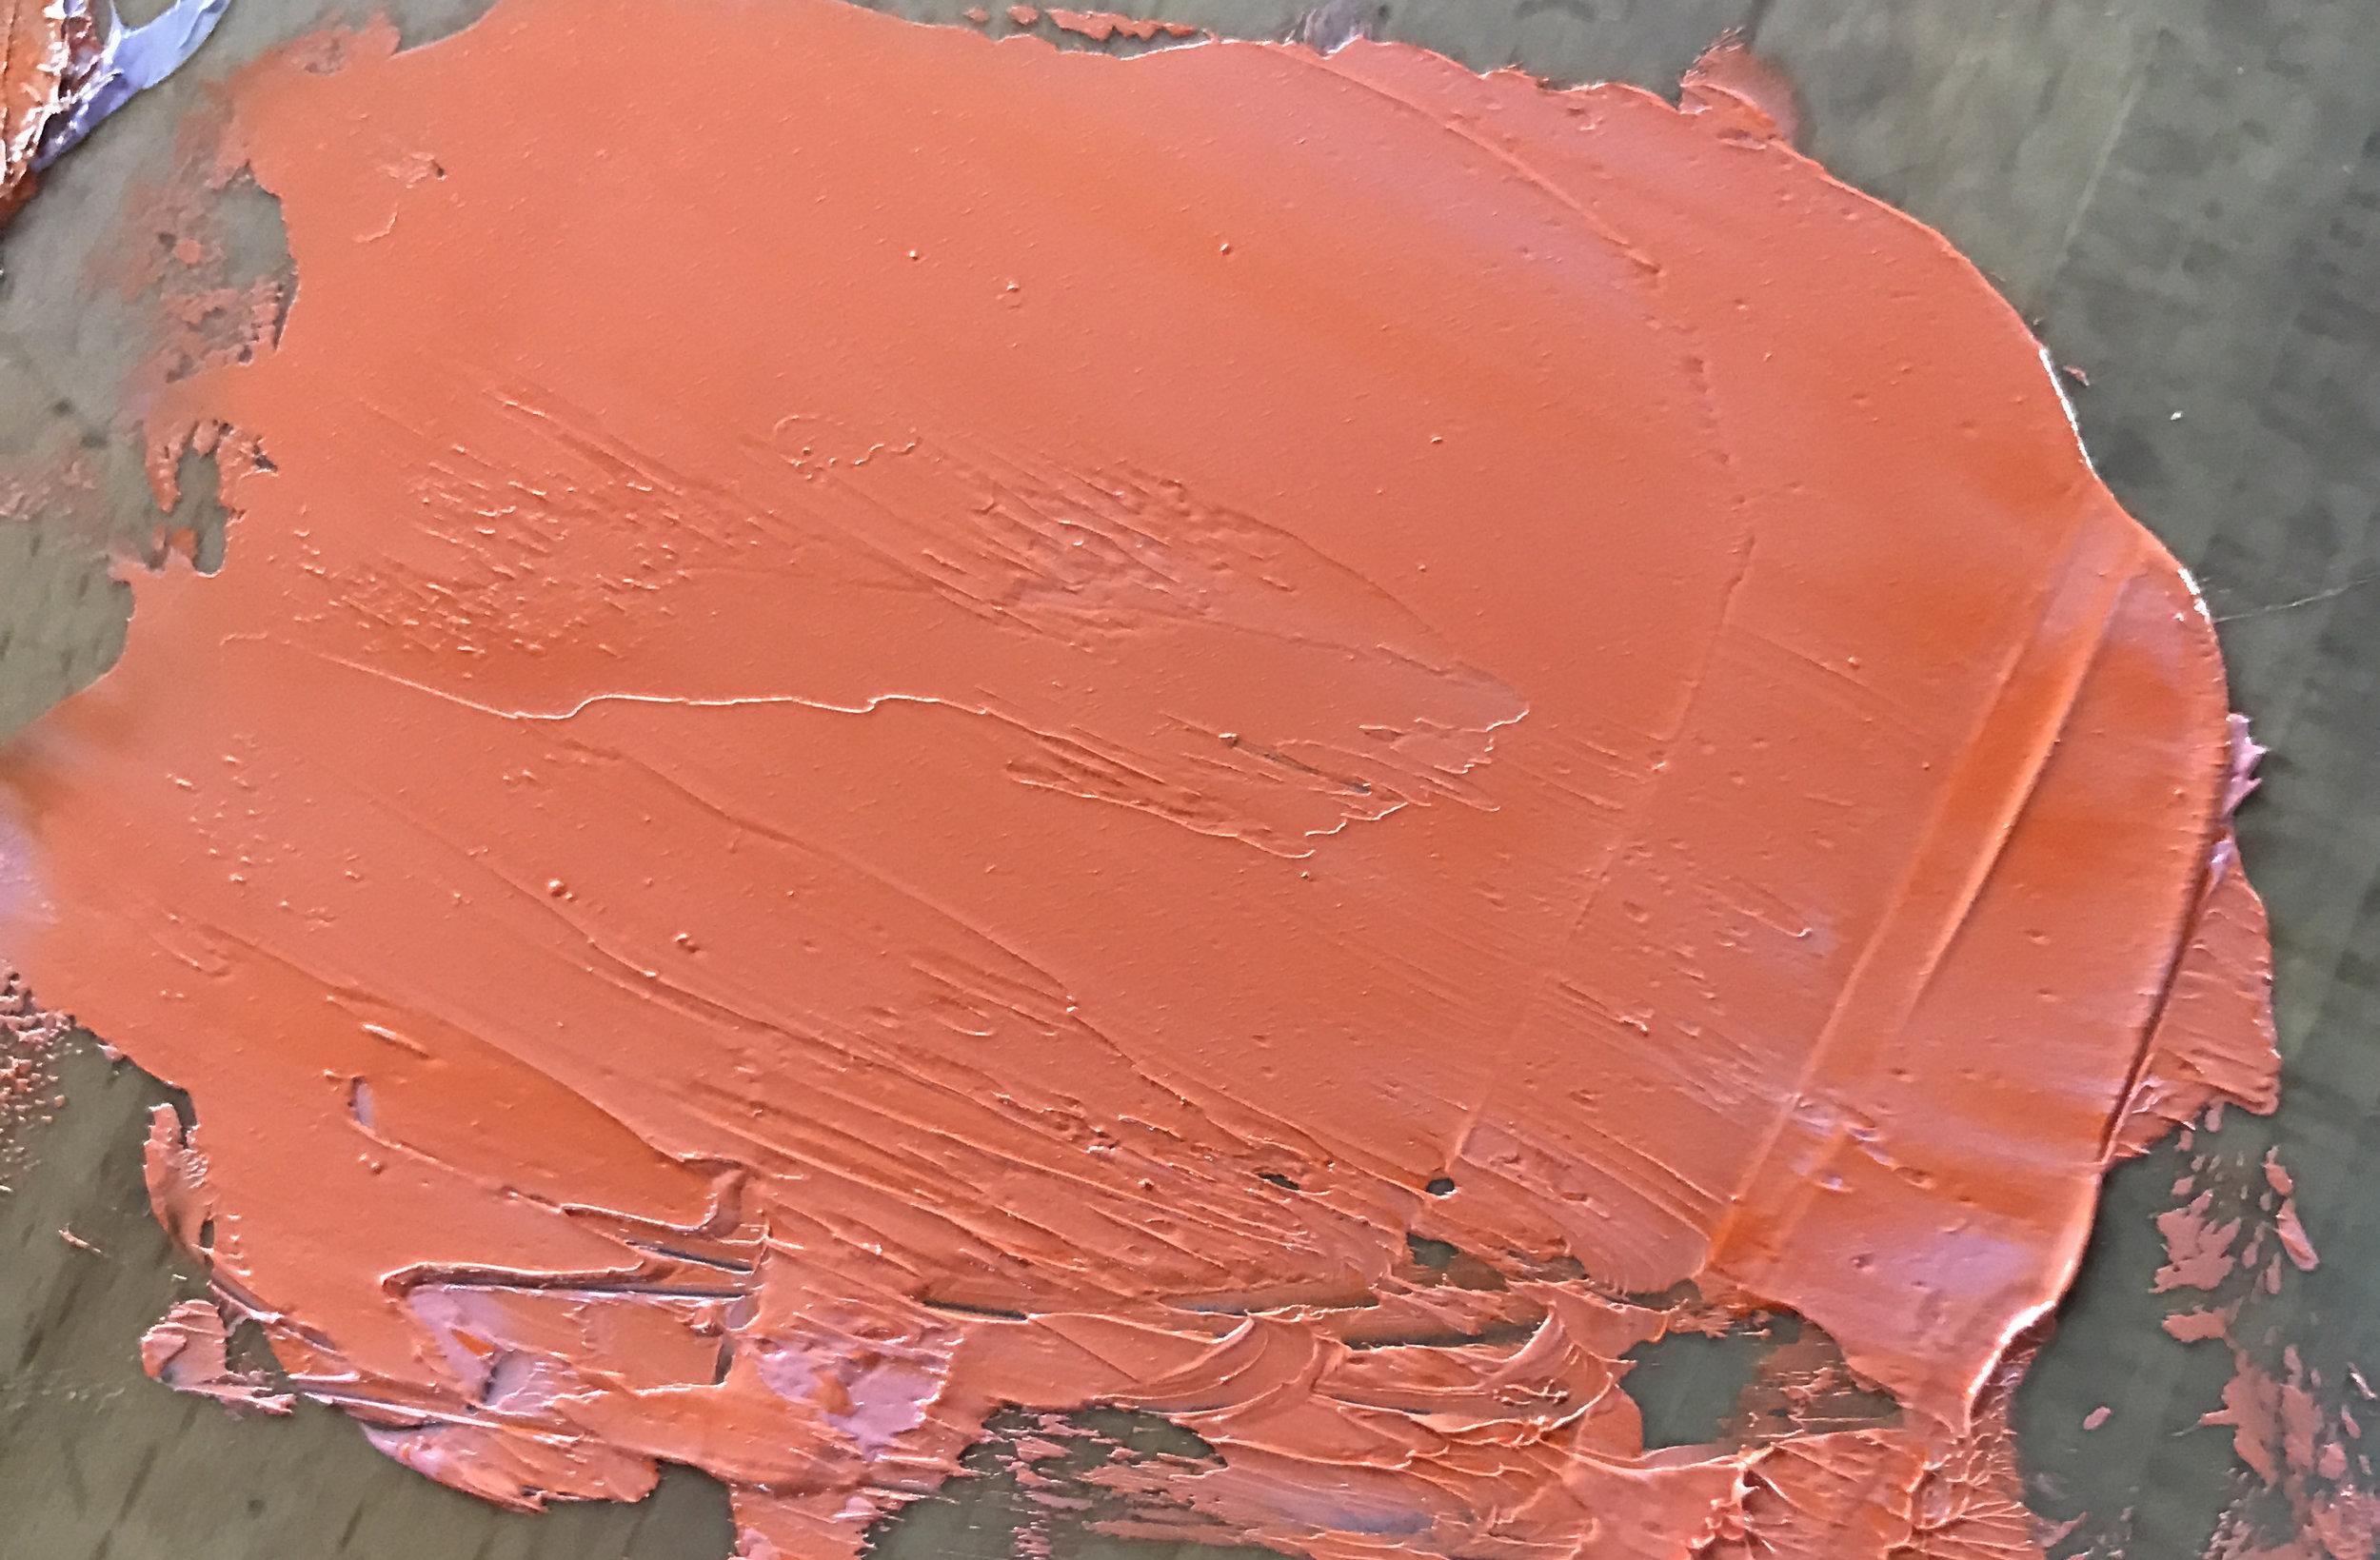 Quinacridone Magenta and Radiant Red (bright pinky orange)